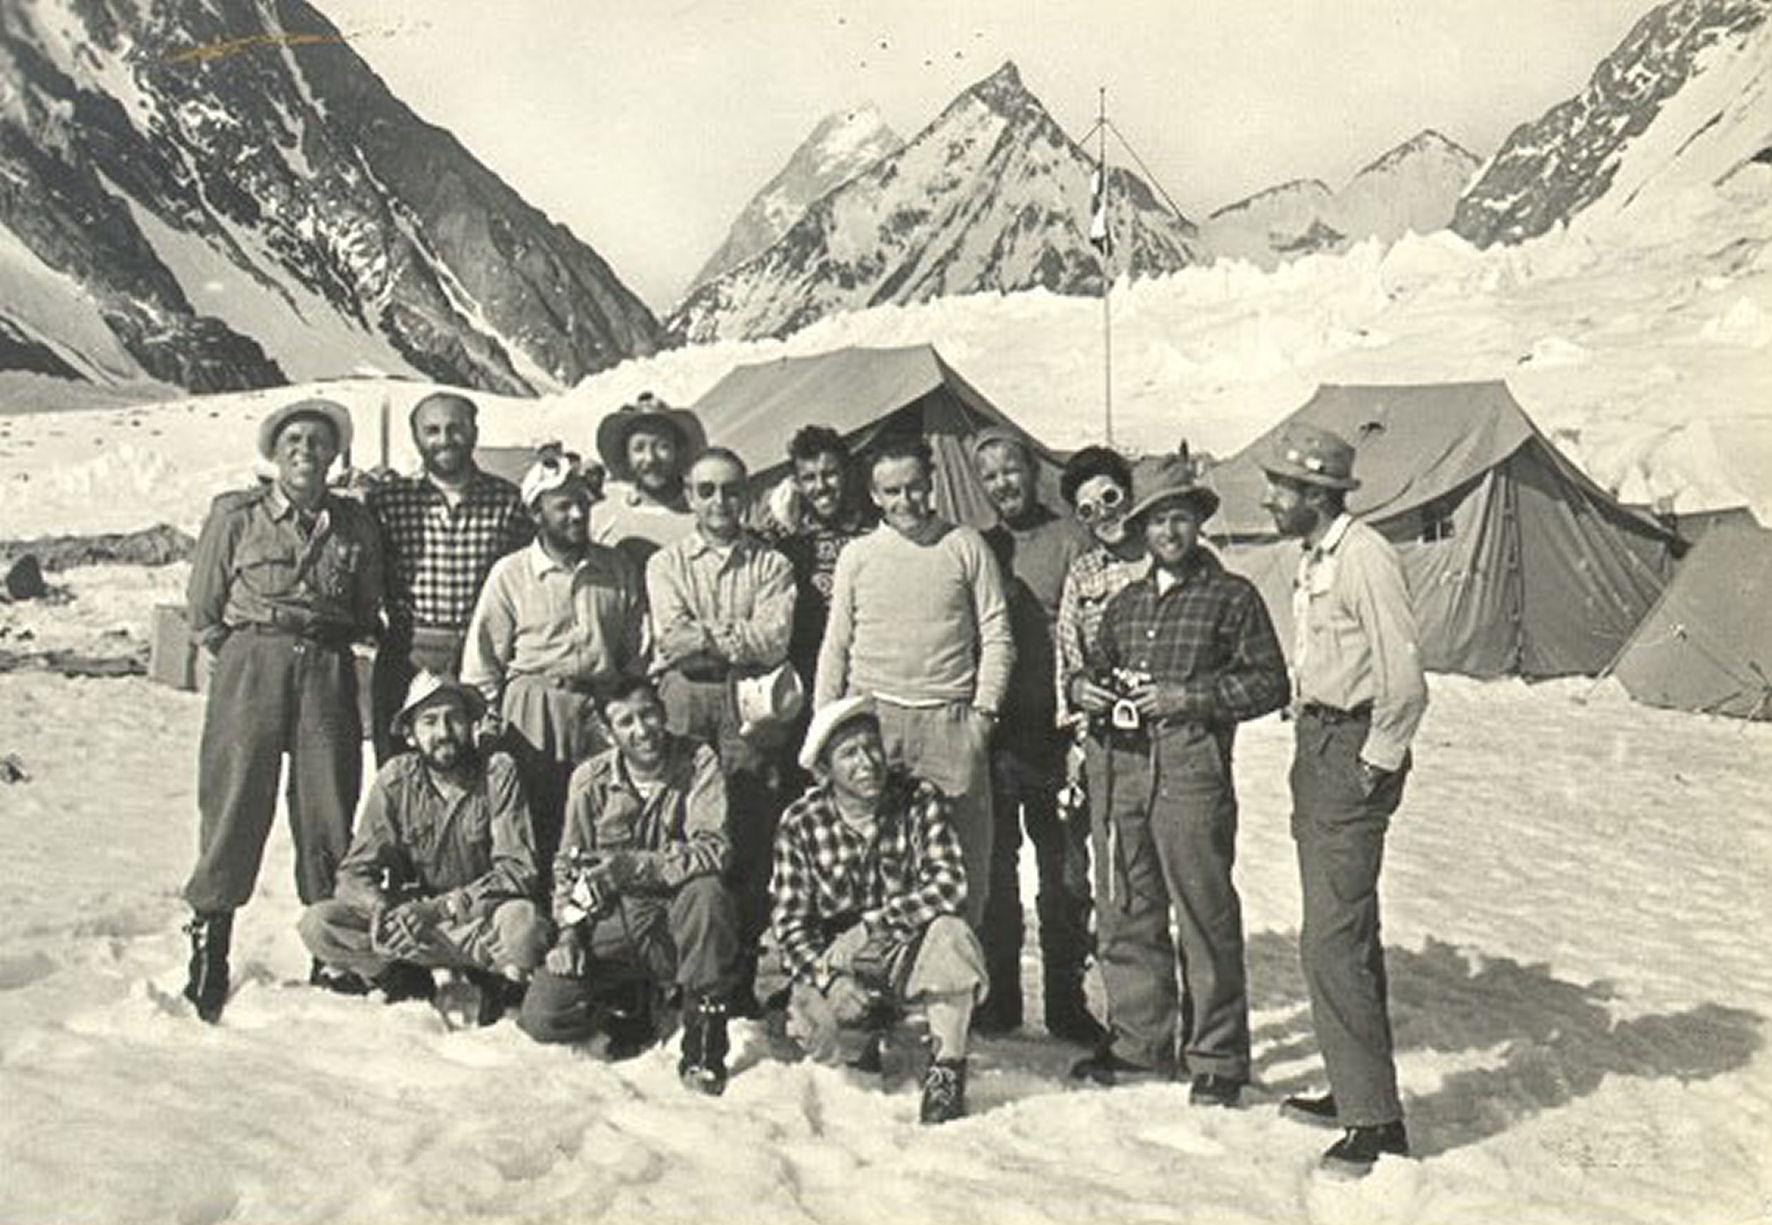 k2 1954